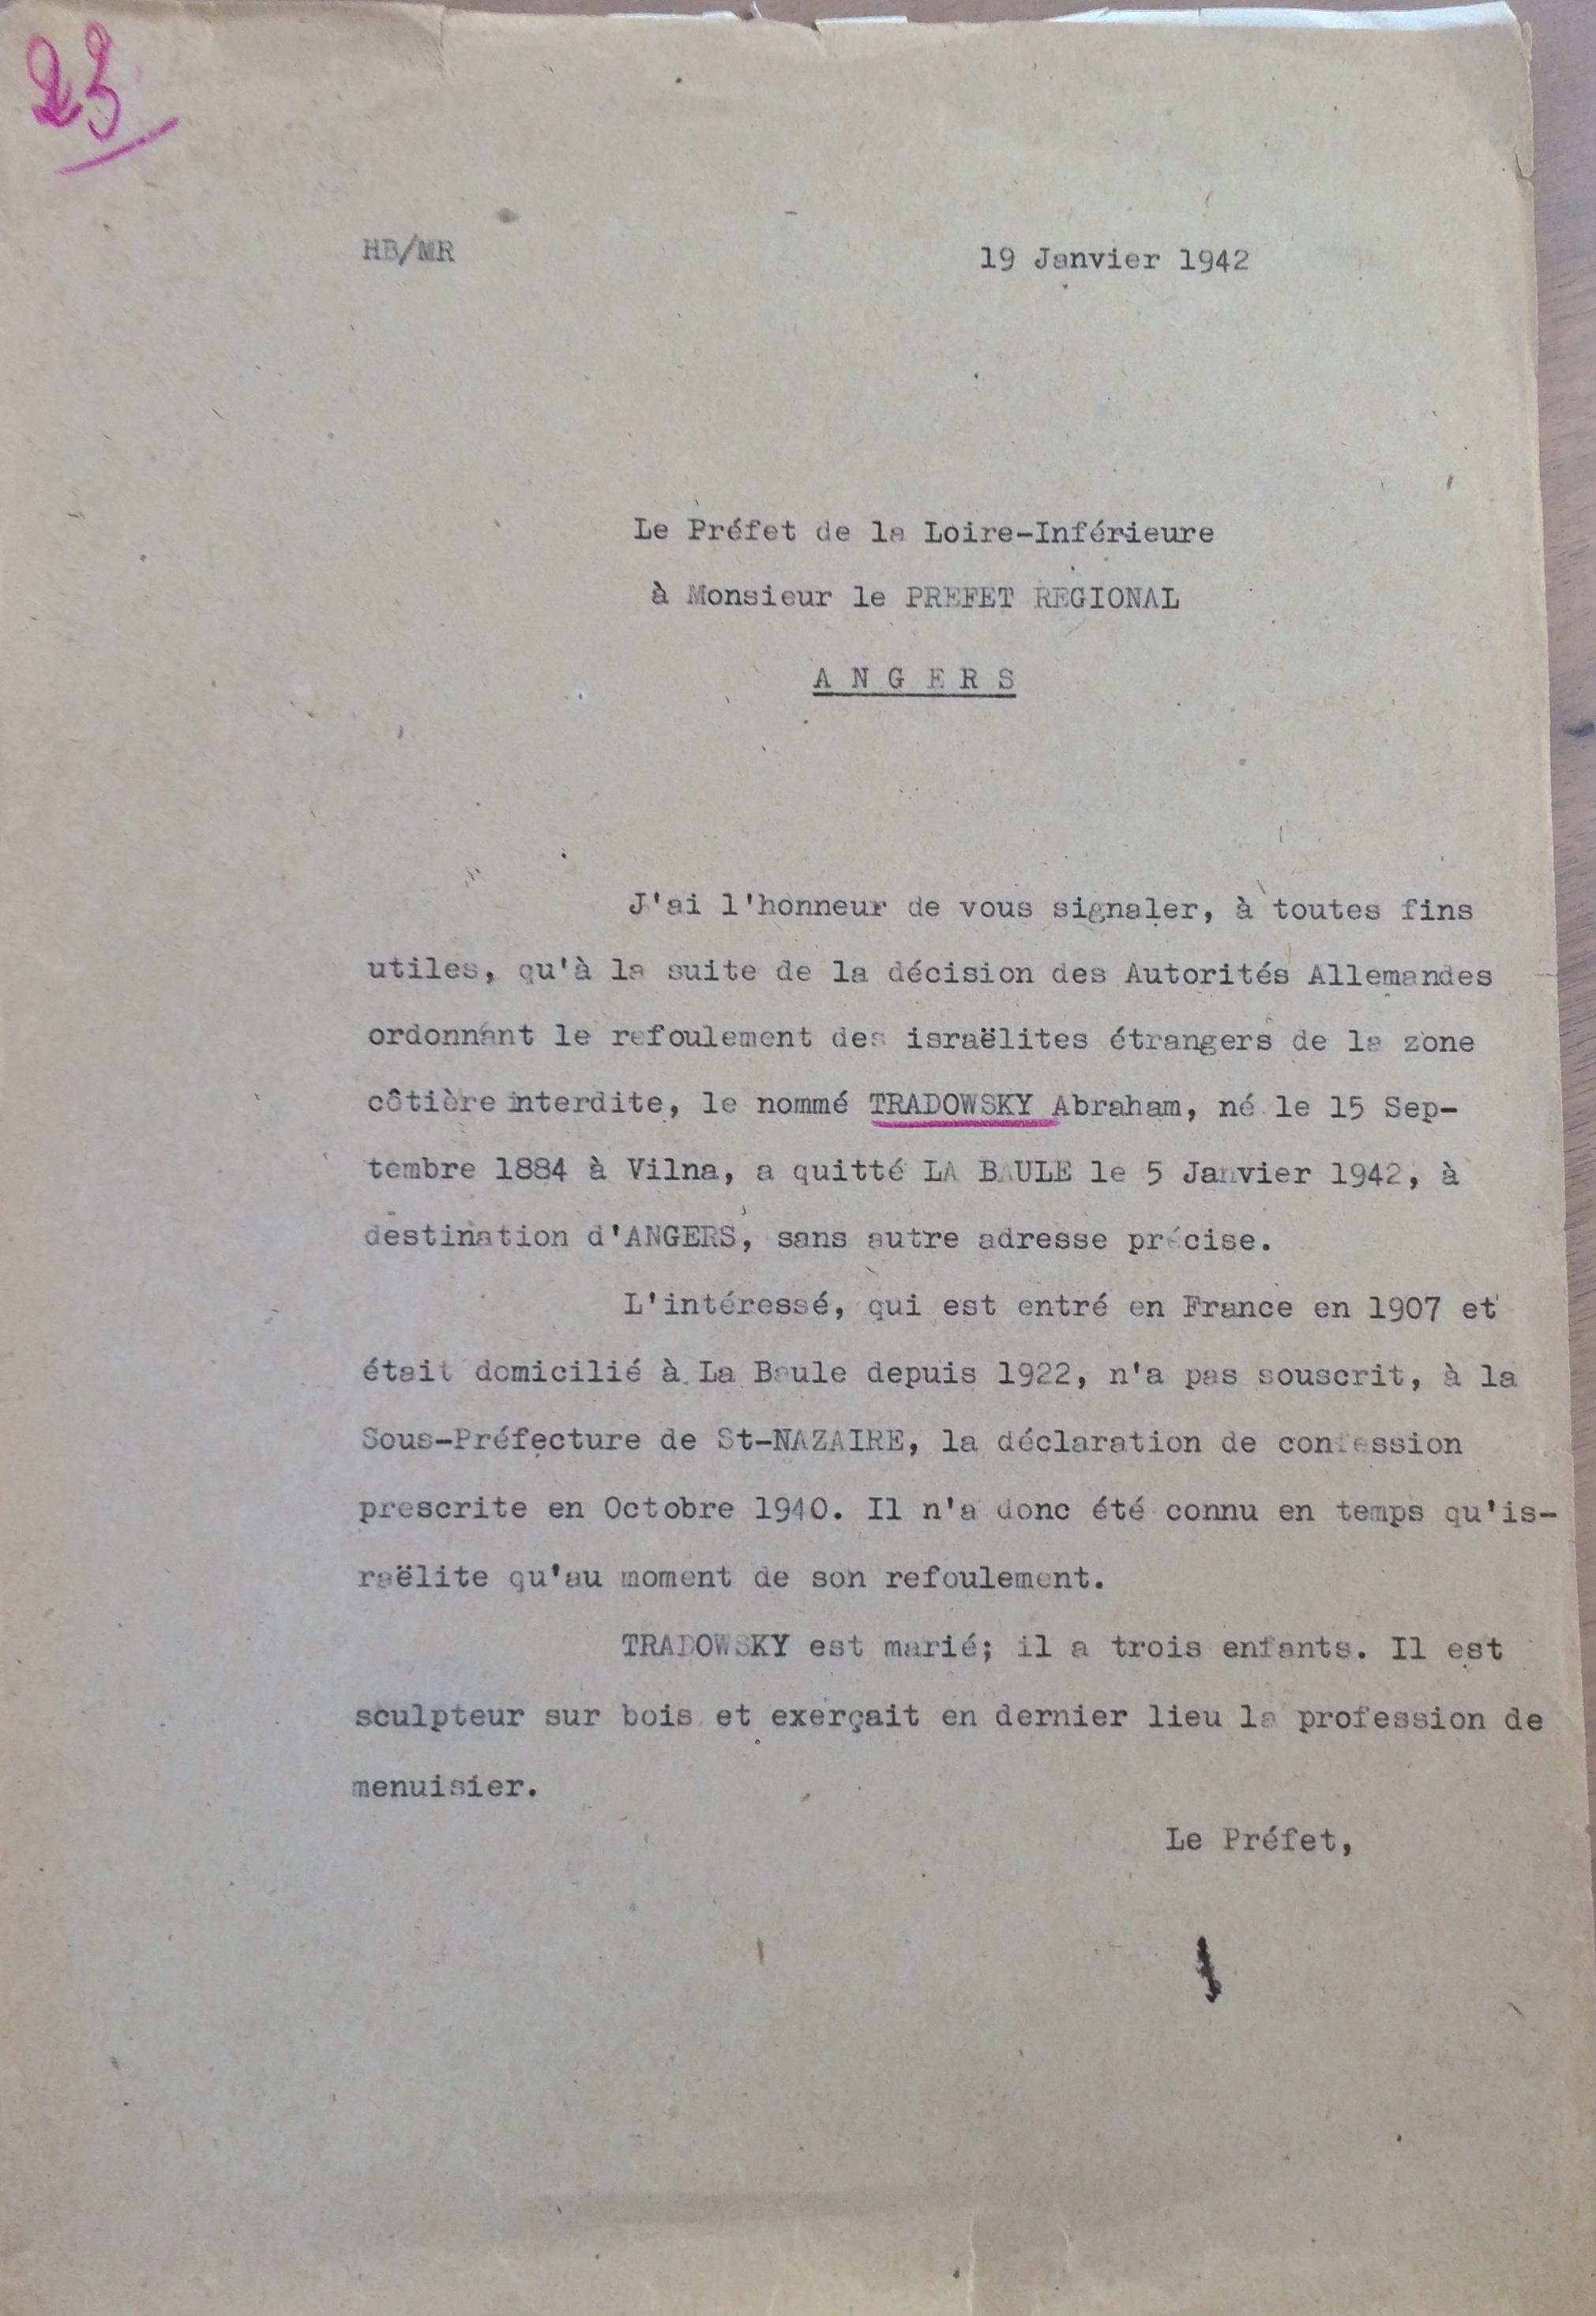 Courrier 1942 TRADOUNSKY